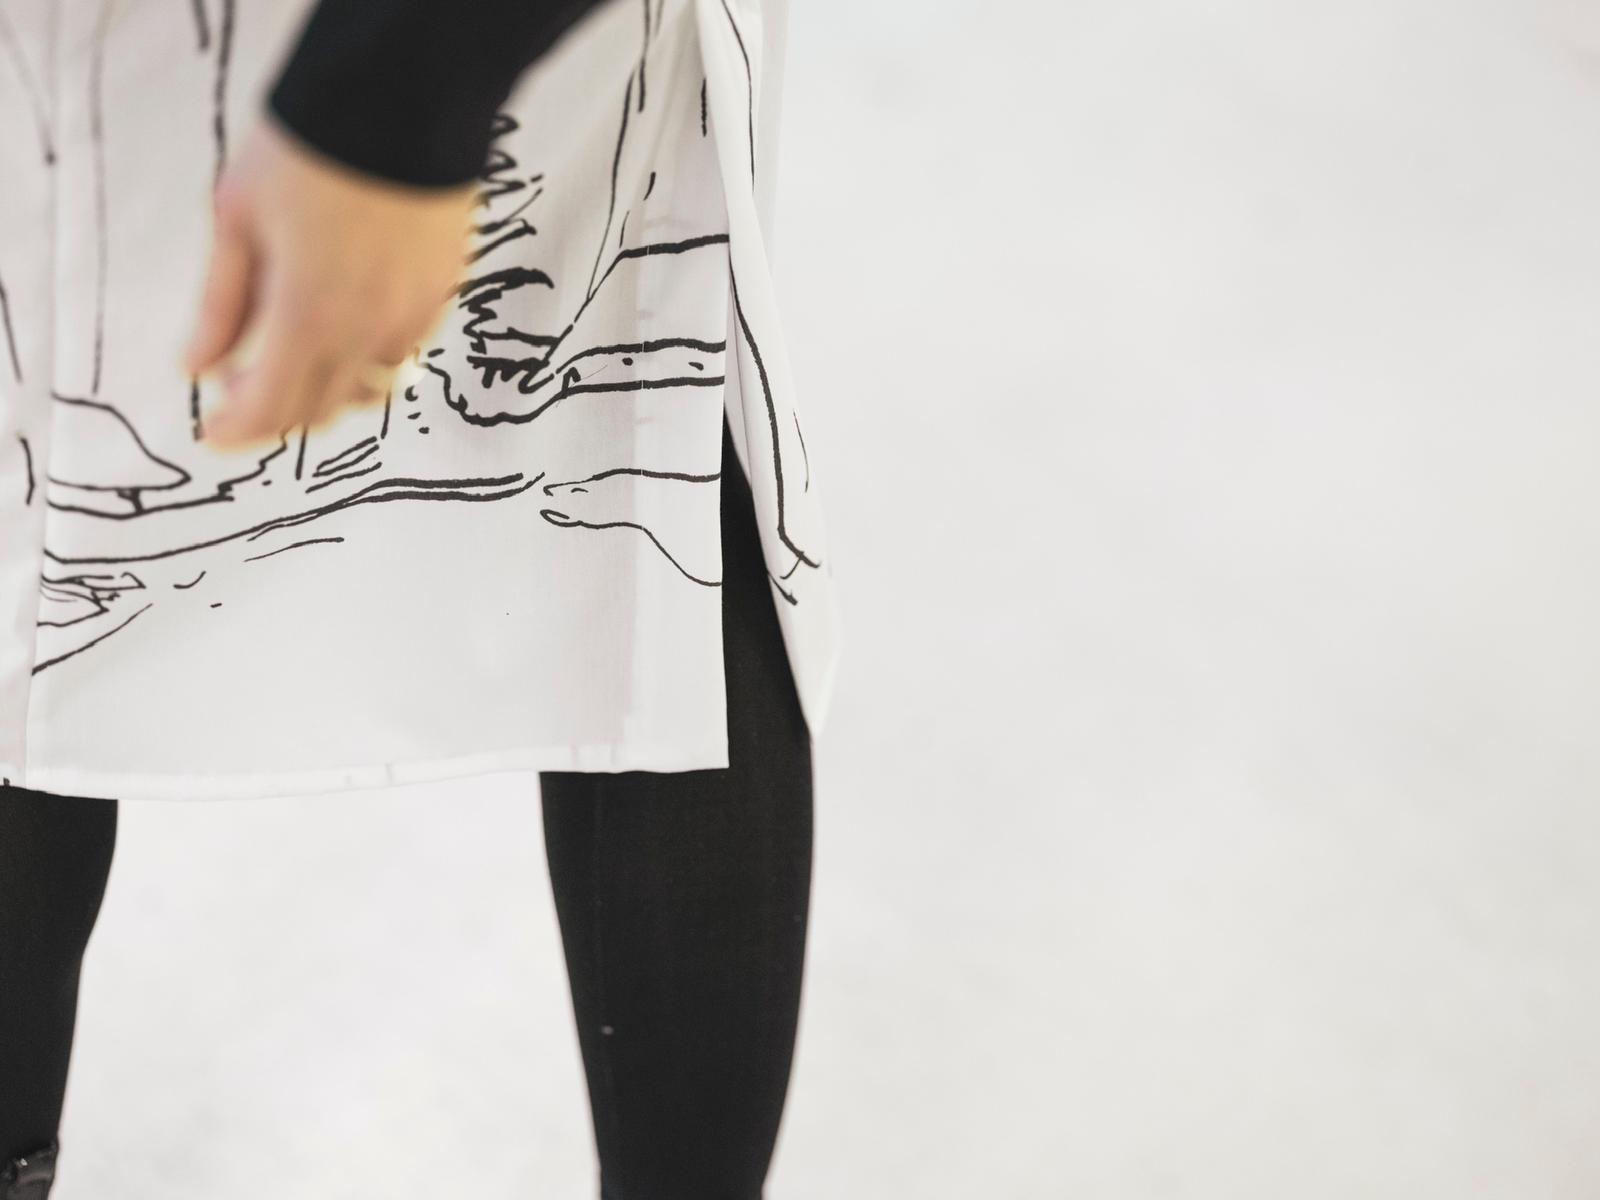 Roberta Organic Fashion Sophia Schneider Esleben Rock Snow 3